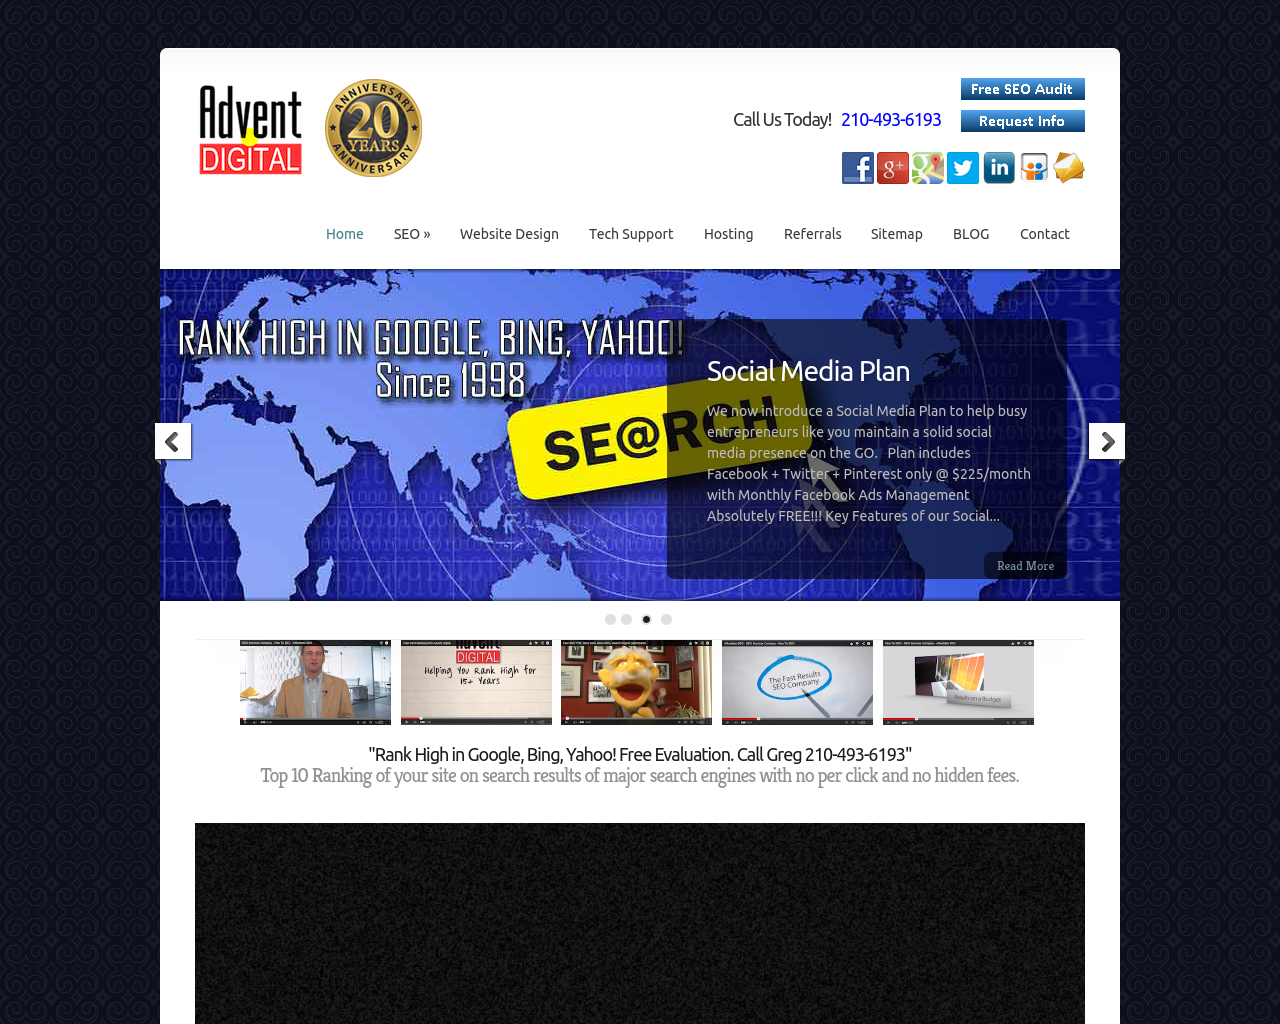 Advent-Digital-Advertising-Reviews-Pricing